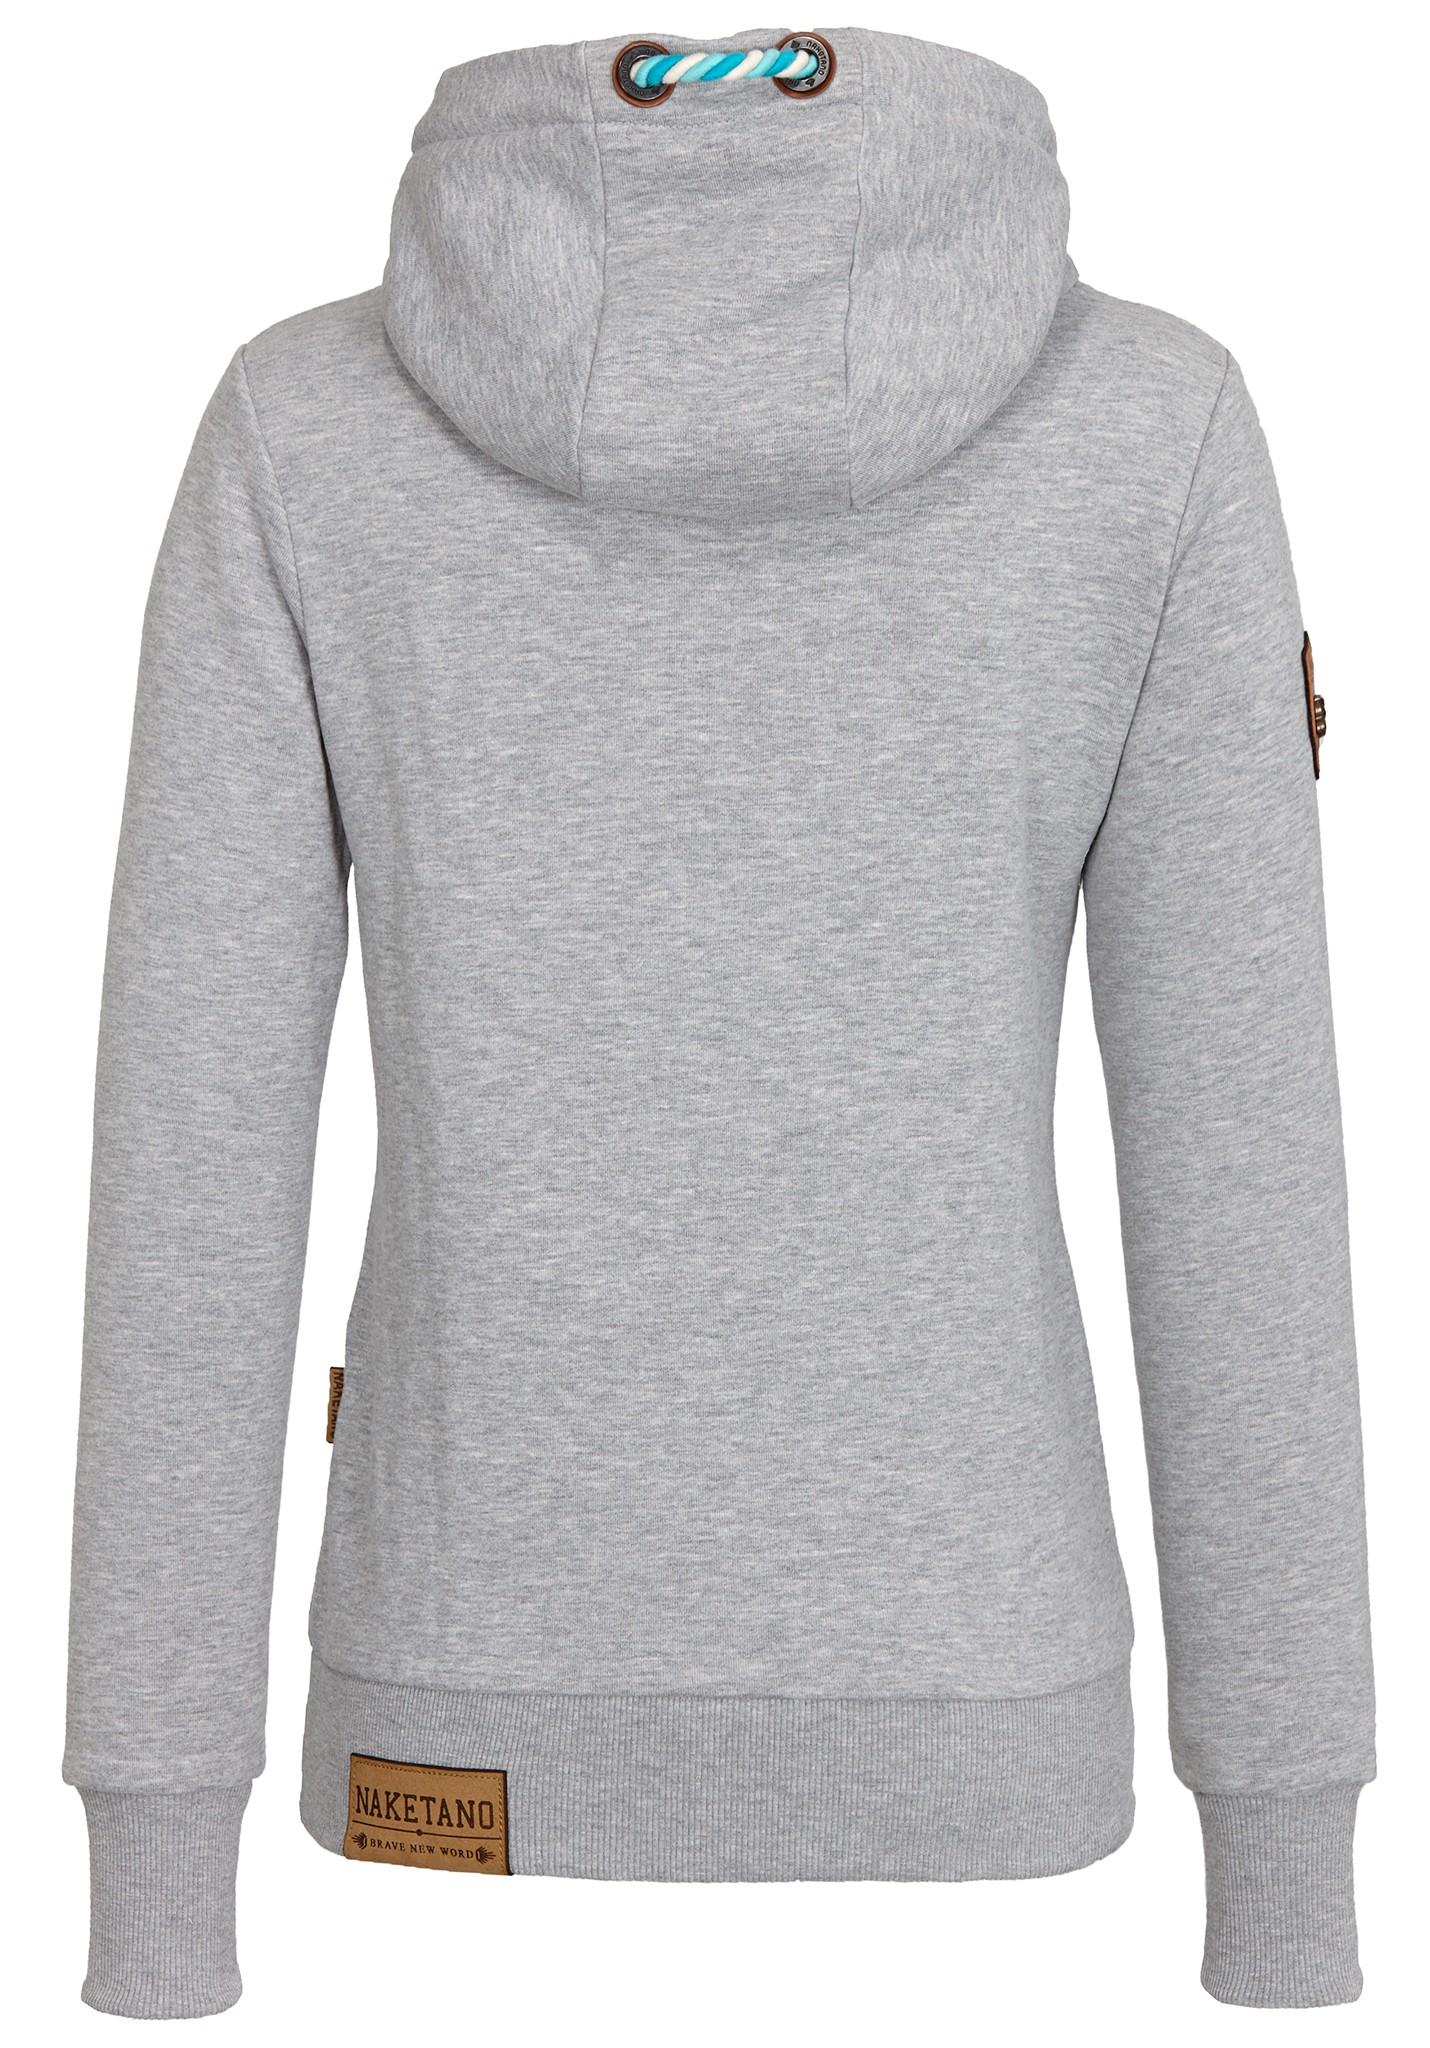 neu naketano schmierlappen jeck damen kapuzenpullover pullover hoodie ebay. Black Bedroom Furniture Sets. Home Design Ideas